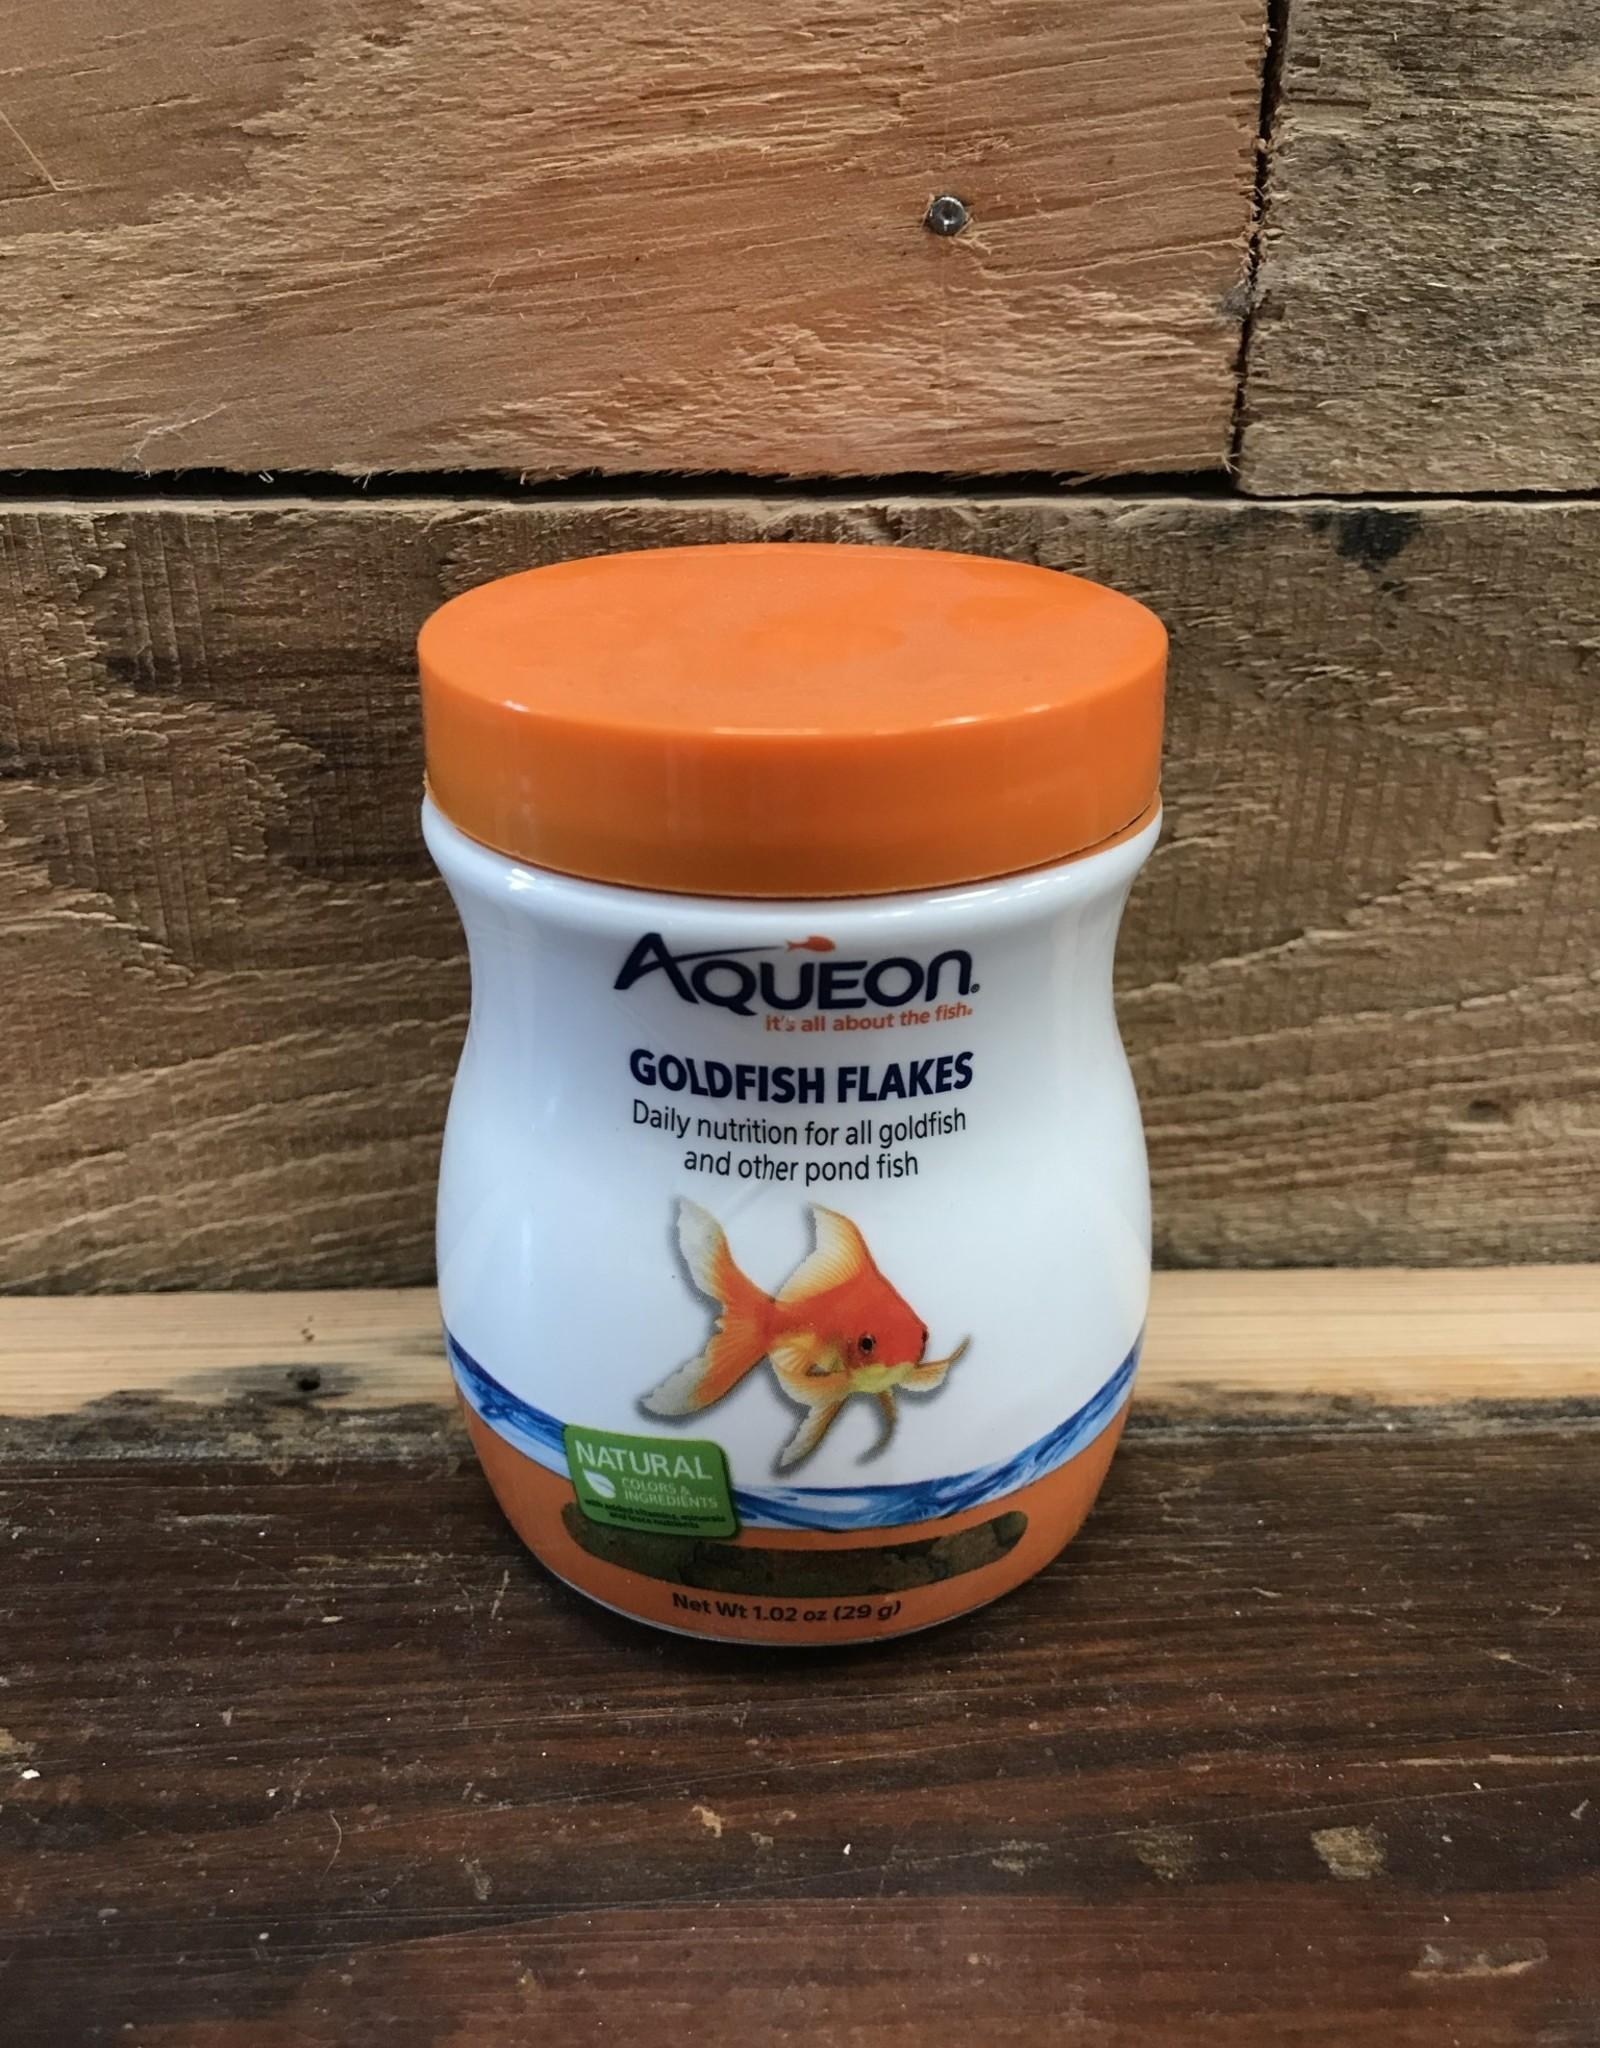 Aqueon Aqueon Goldfish Flake 1.02 oz